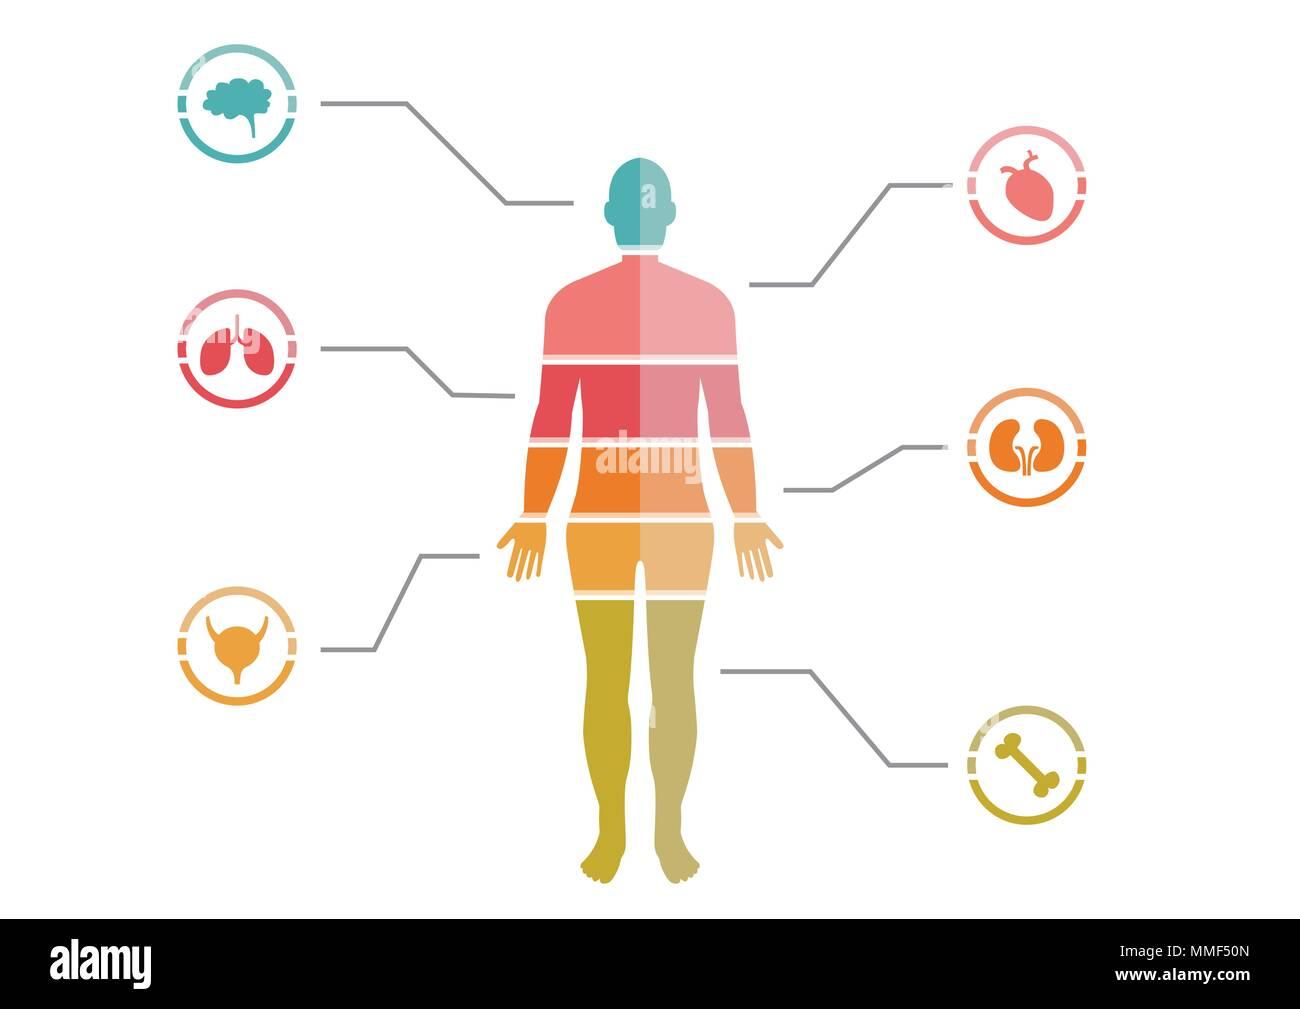 Fein Körper Anatomie Charts Bilder - Anatomie Ideen - finotti.info